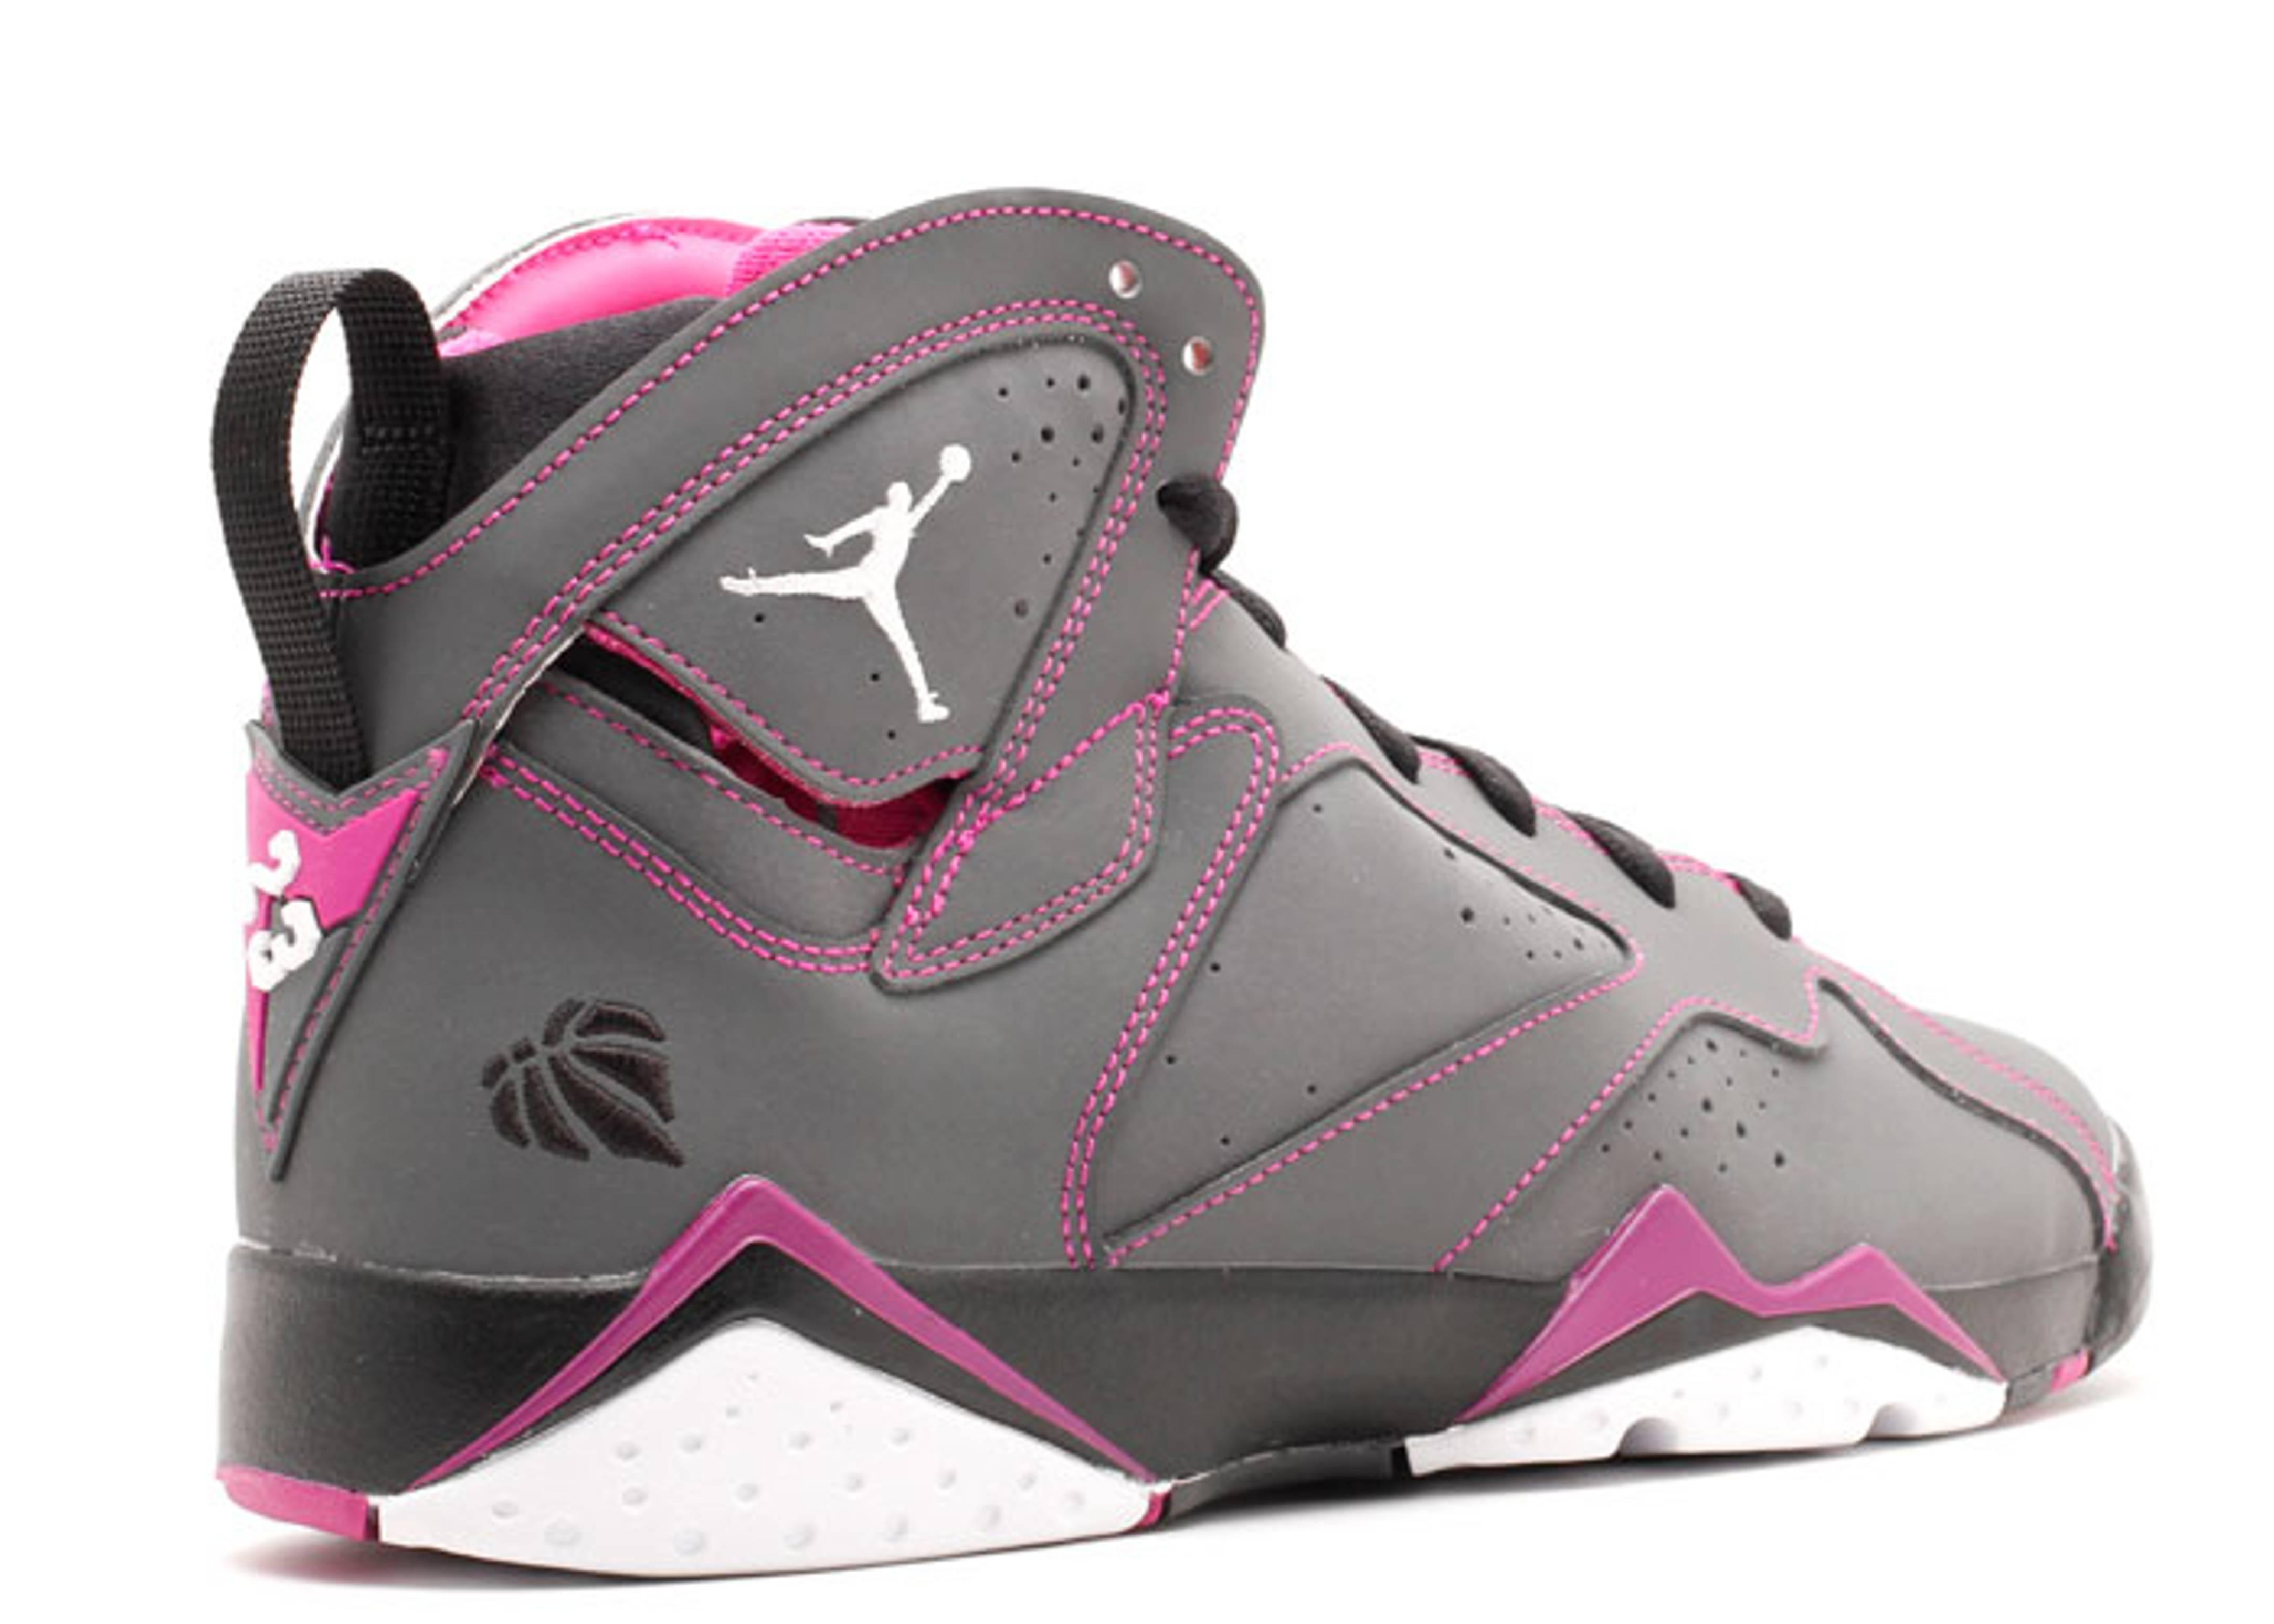 Air Jordan 7 Retro 30th Gg Dark Greywhite Blck Fchs Flsh